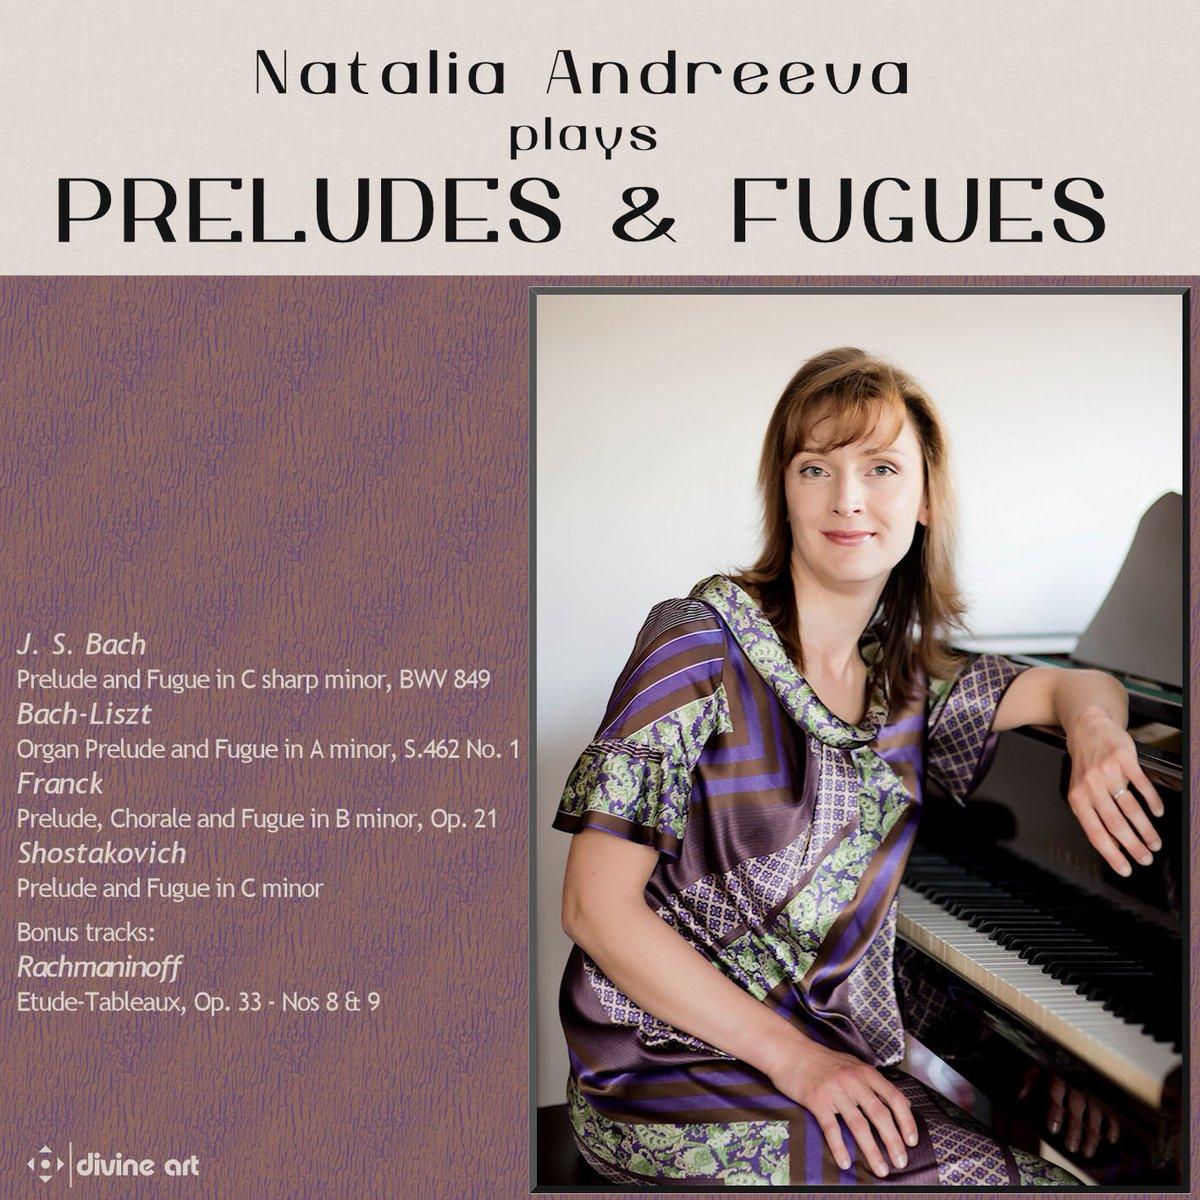 Twitter Natalia Andreeva nude photos 2019